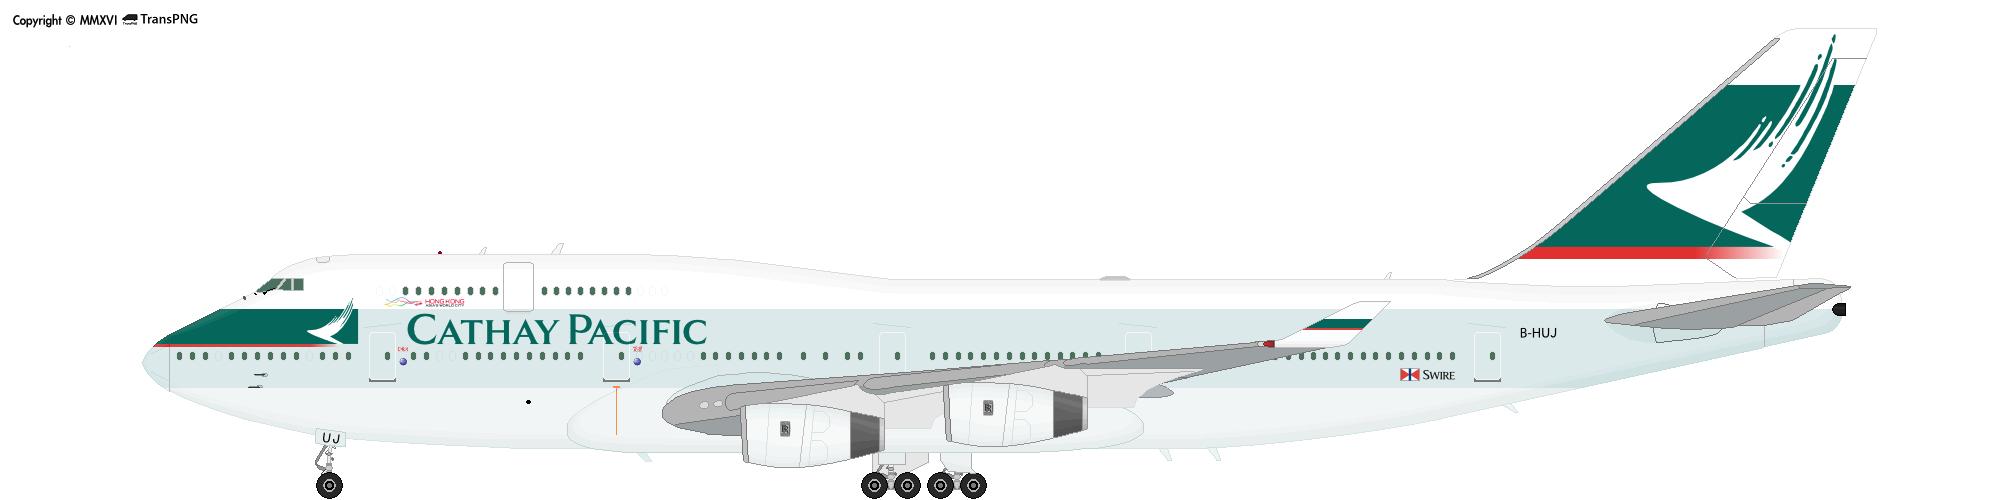 Airplane 6211